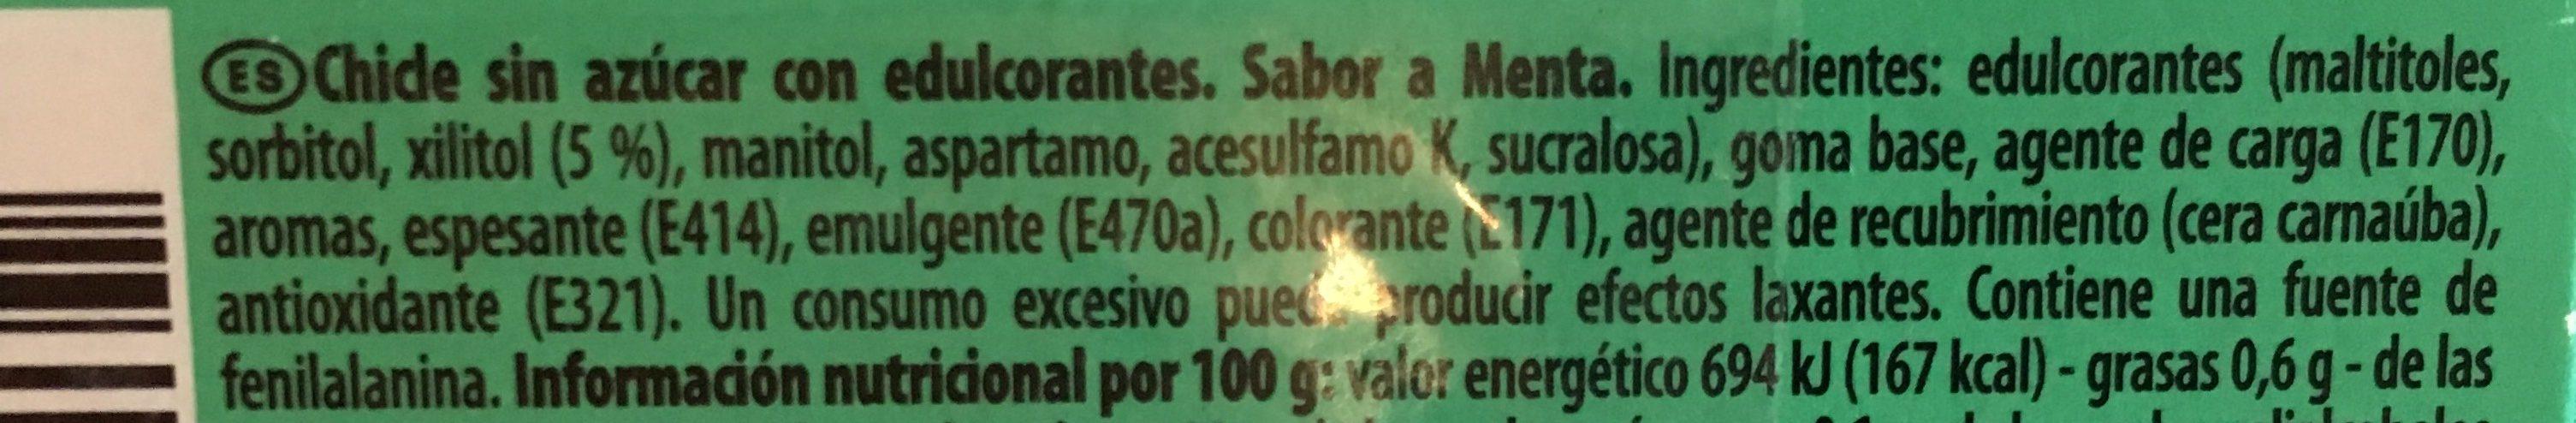 Trident - Dental+ menta fresca - Ingredientes